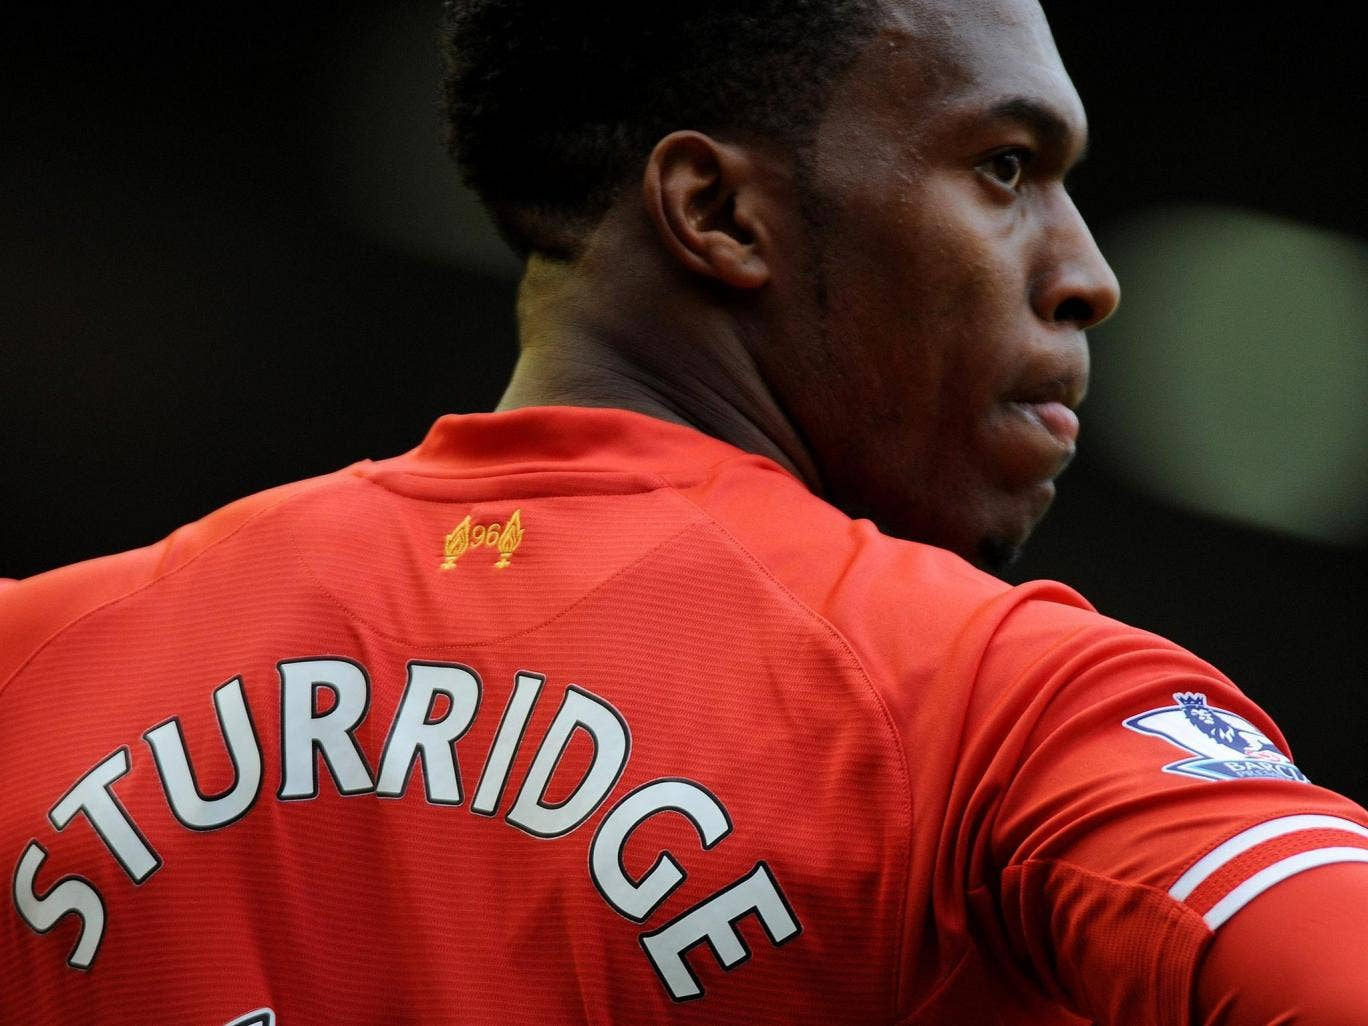 Daniel Sturridge has 20 goals in 25 Premier League games for Liverpool this season